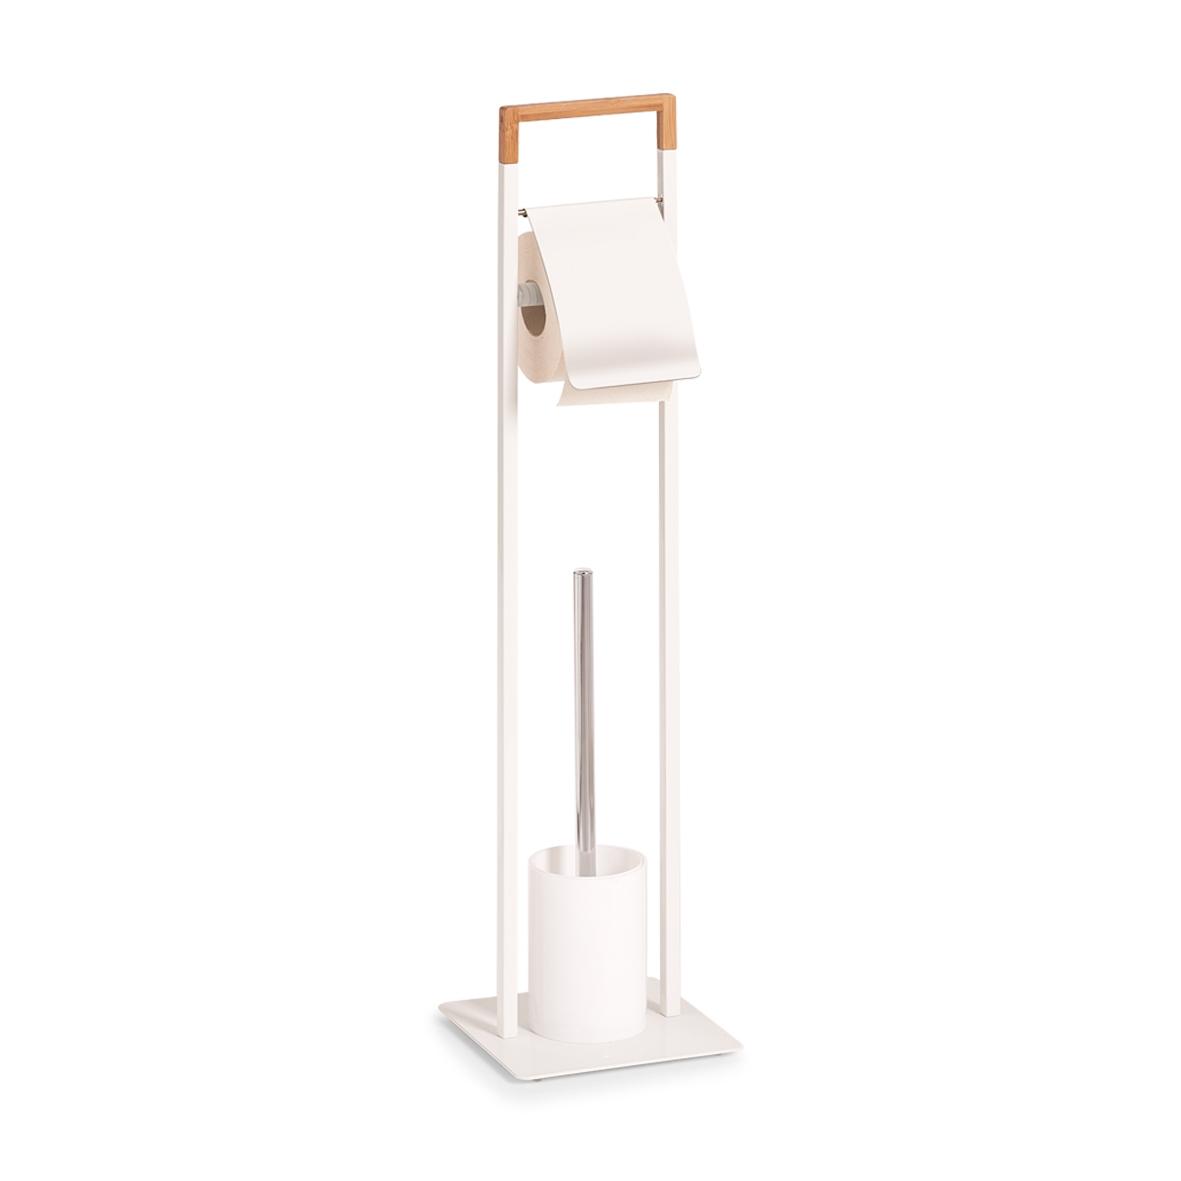 Suport pentru hartie igienica si perie de toaleta, Bamboo Metal White, l19xA19xH74,5 cm din categoria Baie